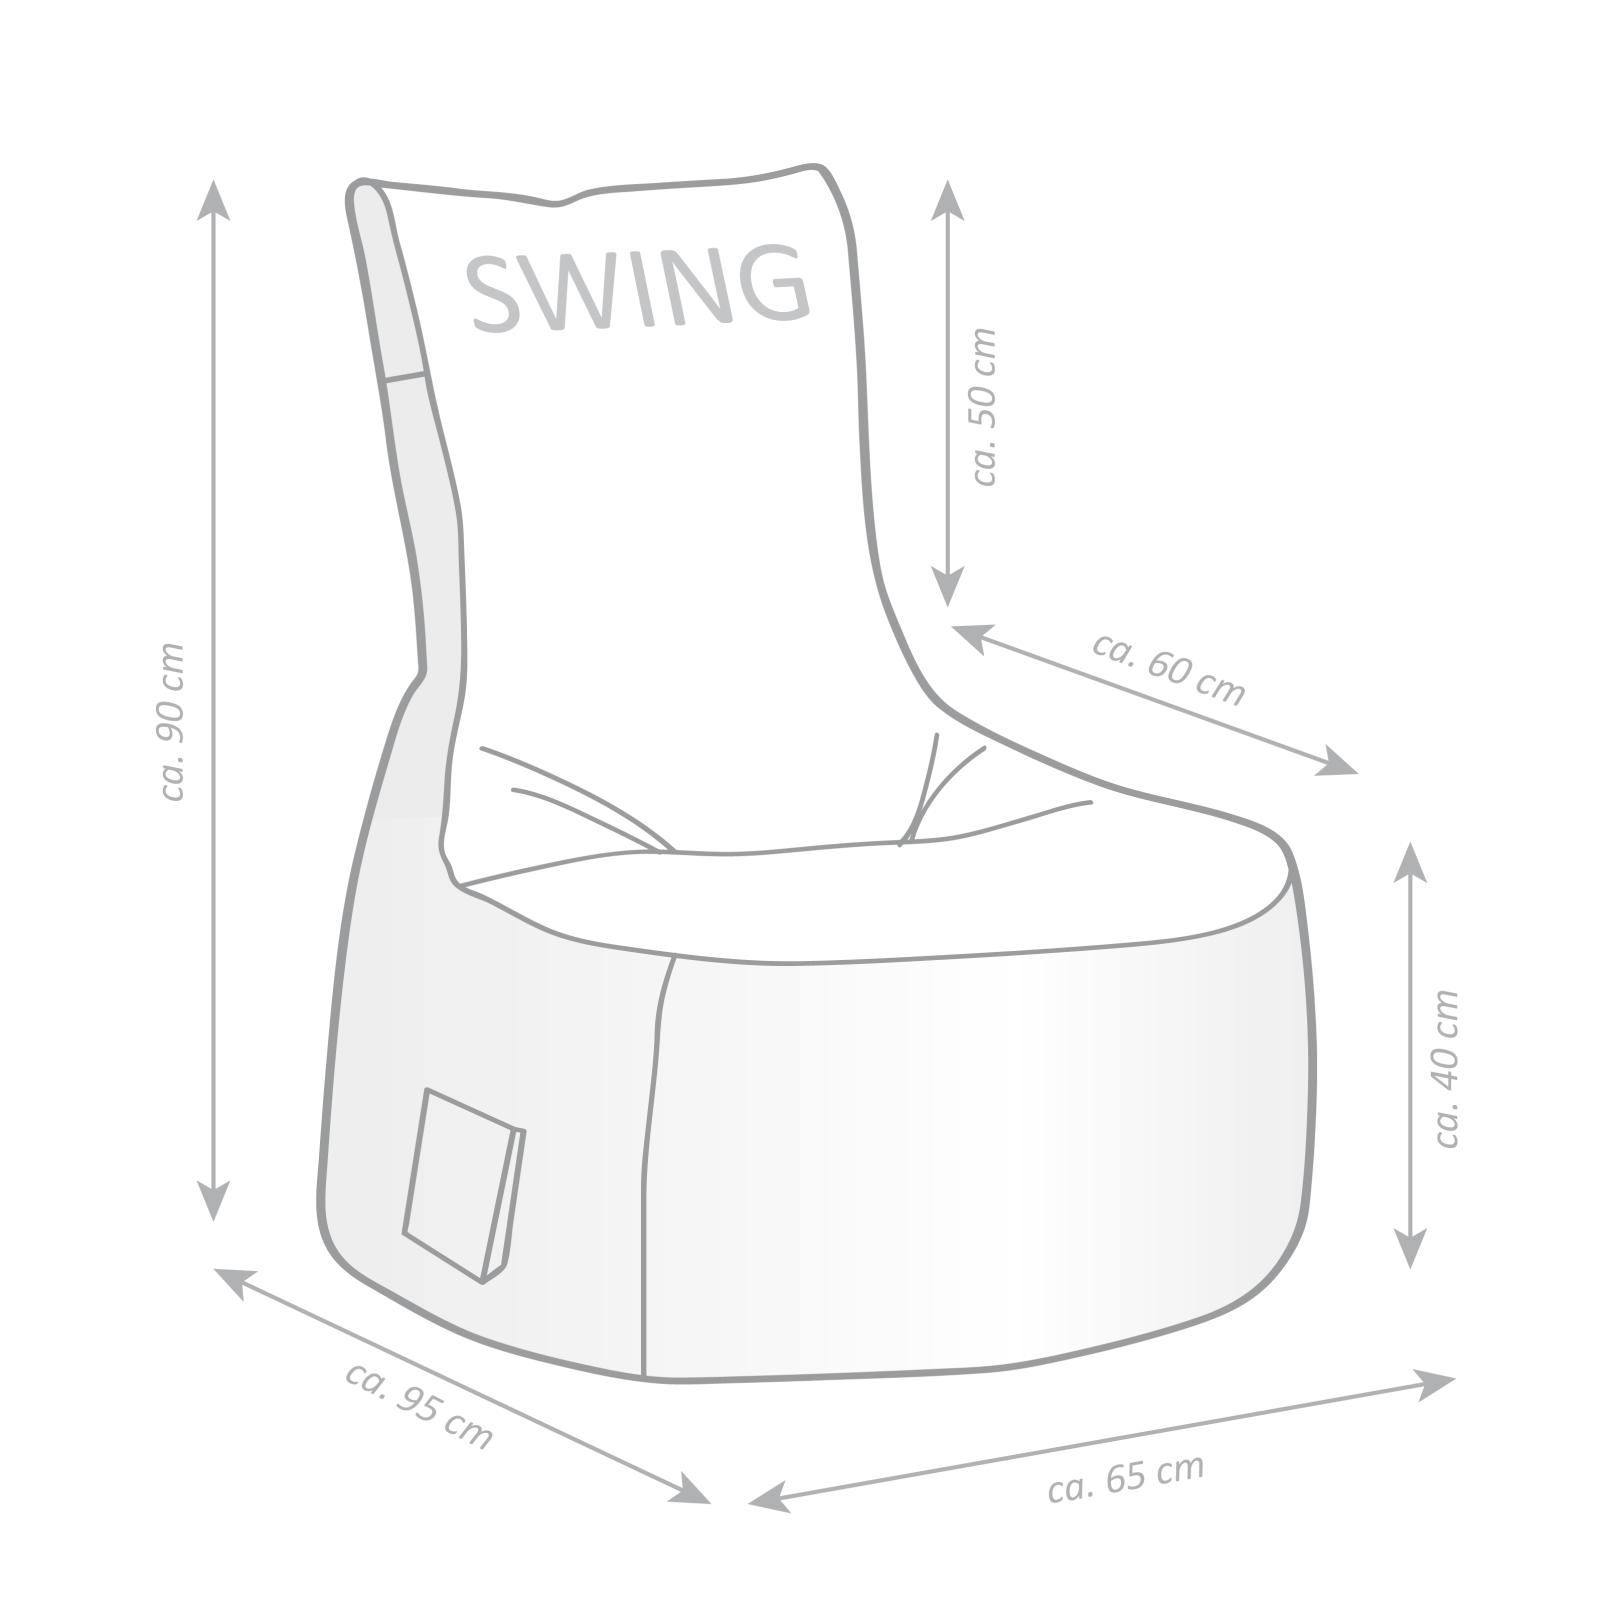 sitzsack scuba swing. Black Bedroom Furniture Sets. Home Design Ideas